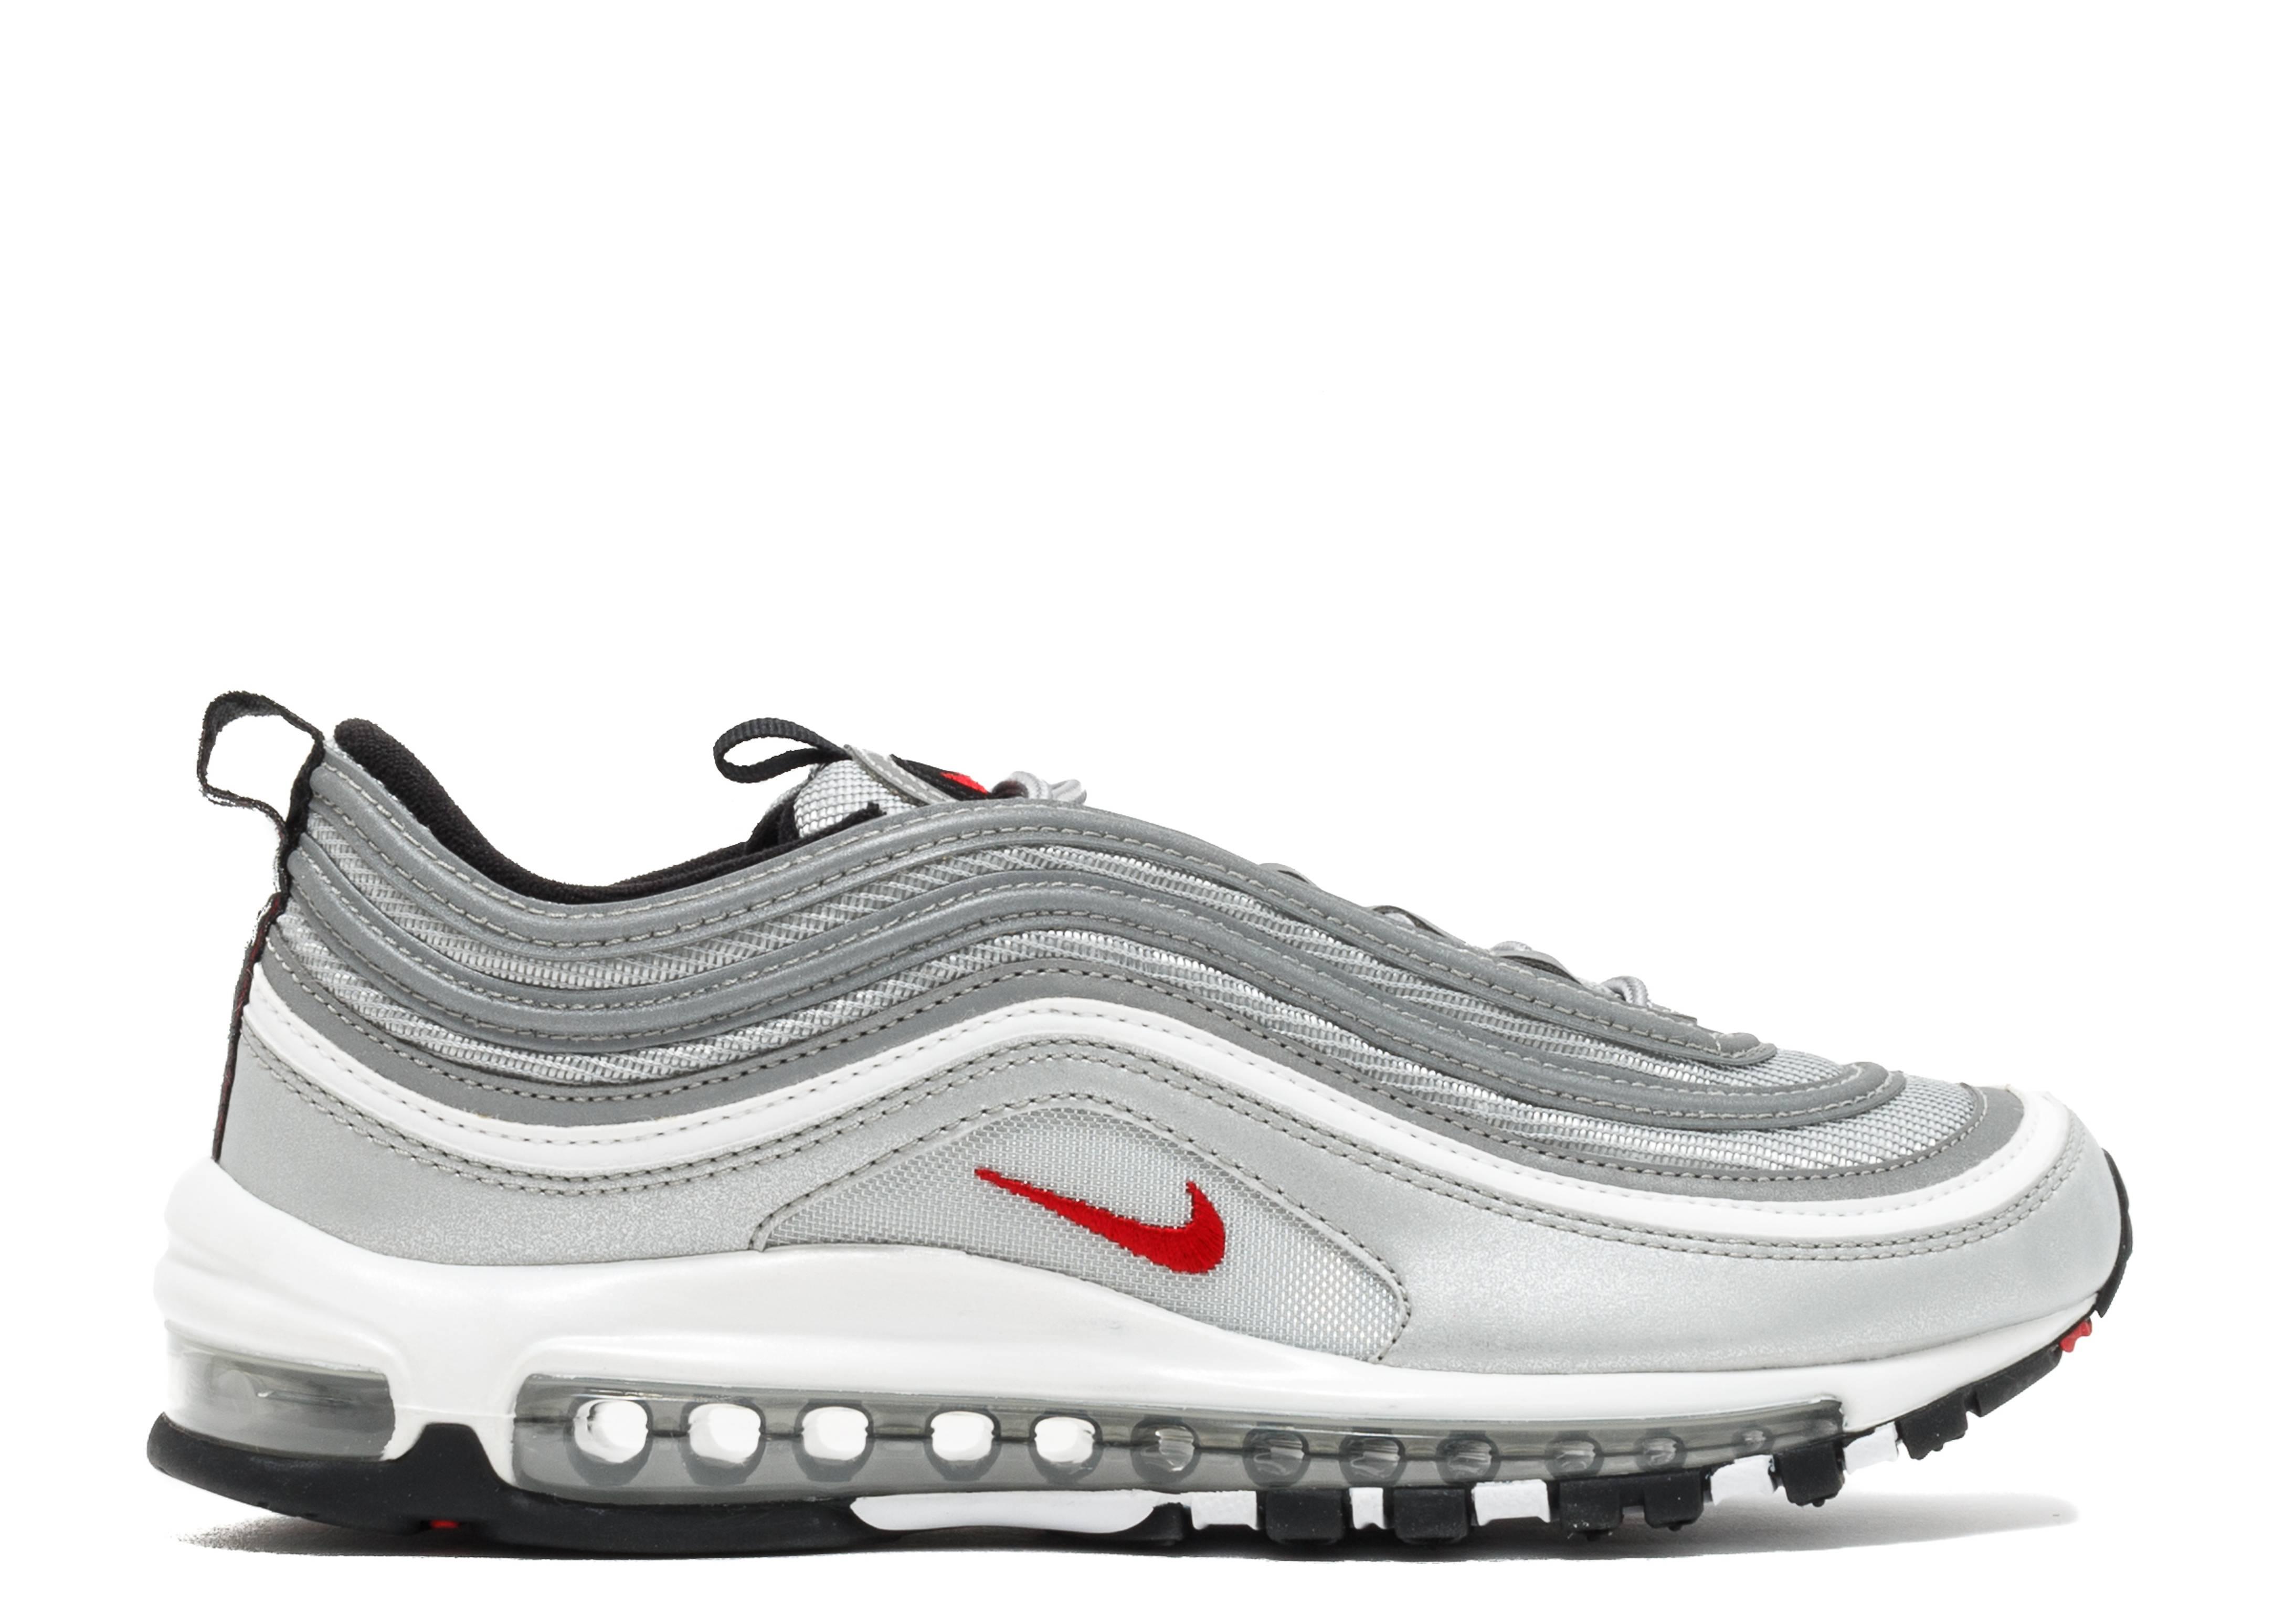 Nike Air Max 97 Og Qs